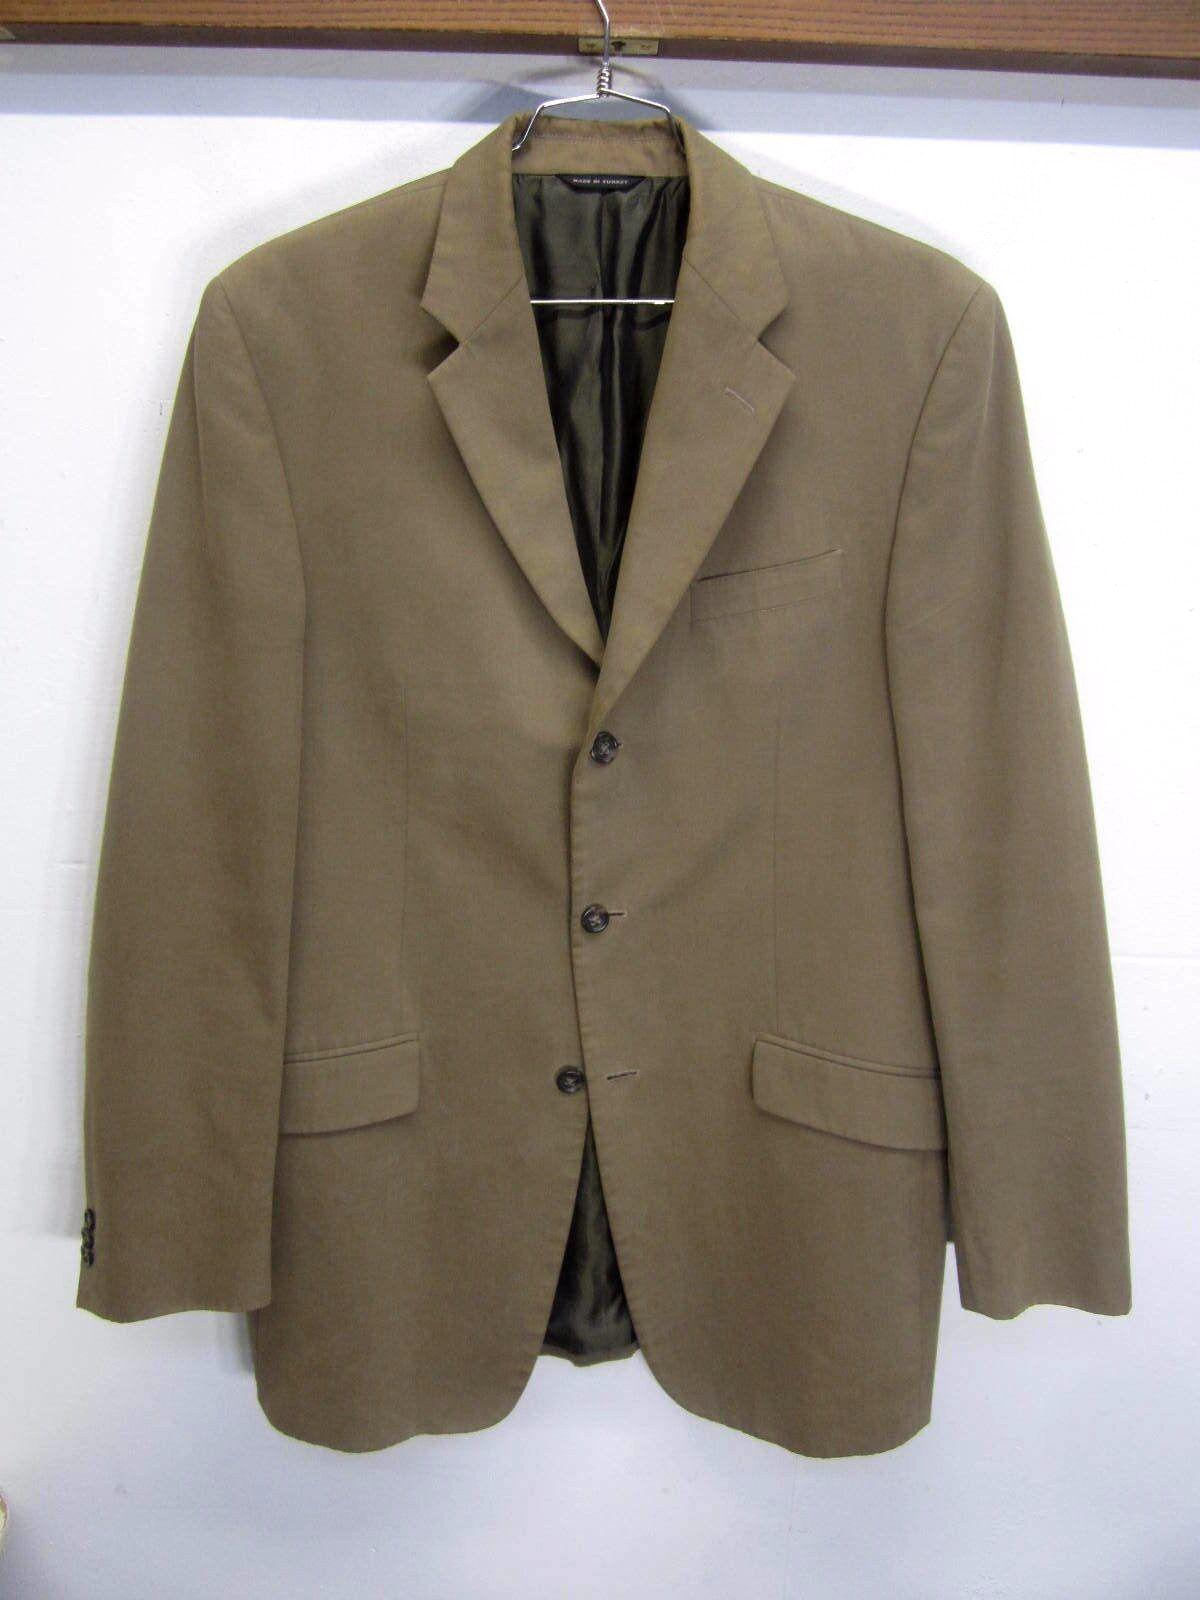 EUC  Banana Republic Blazer Sport Coat Braun 100% cotton 3 btn sz 42L